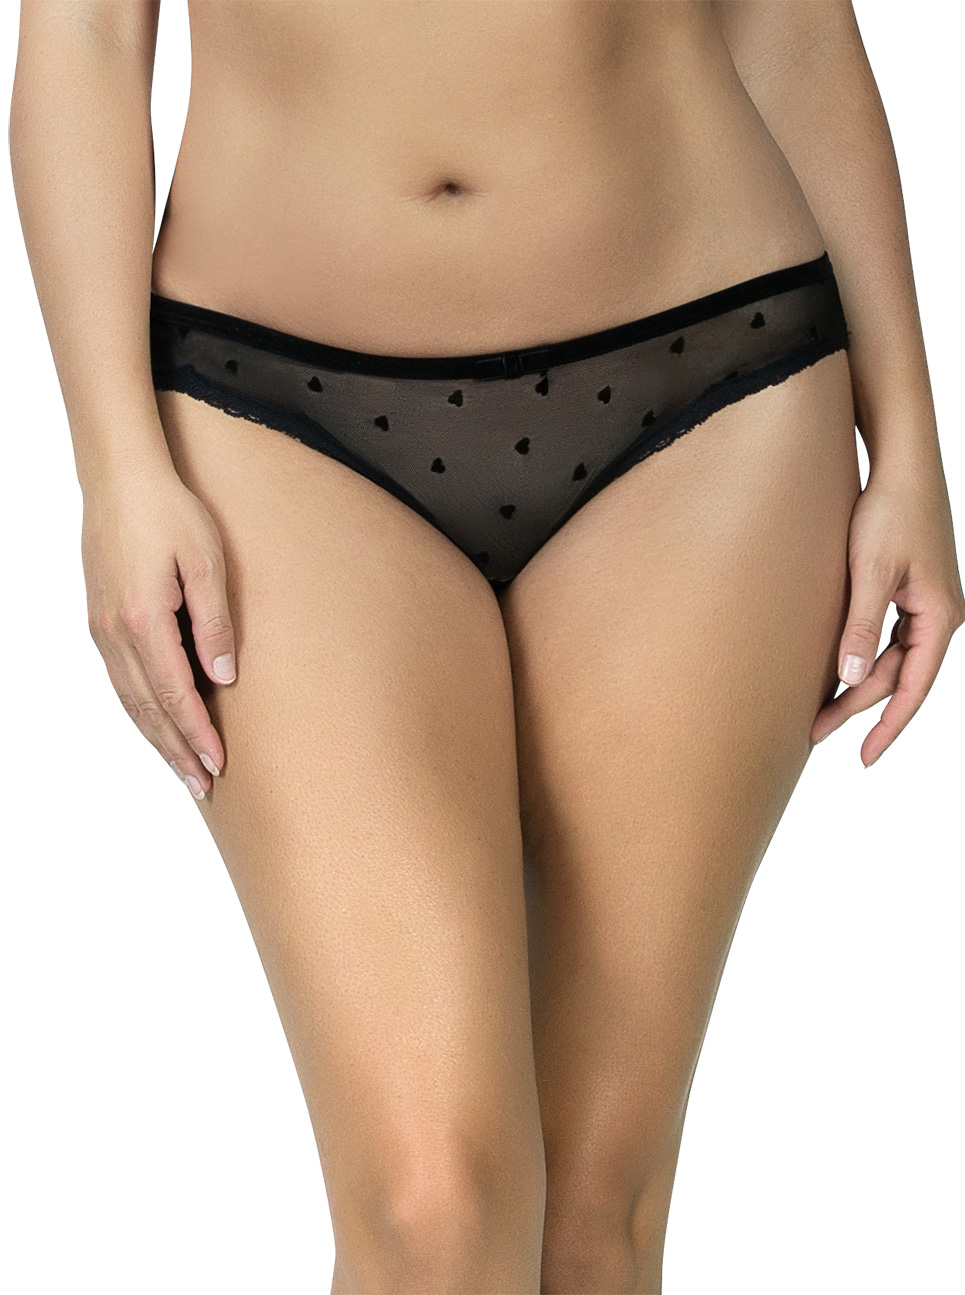 PARFAIT Lily BikiniP5813 Black Front - Lily Bikini Black P5813